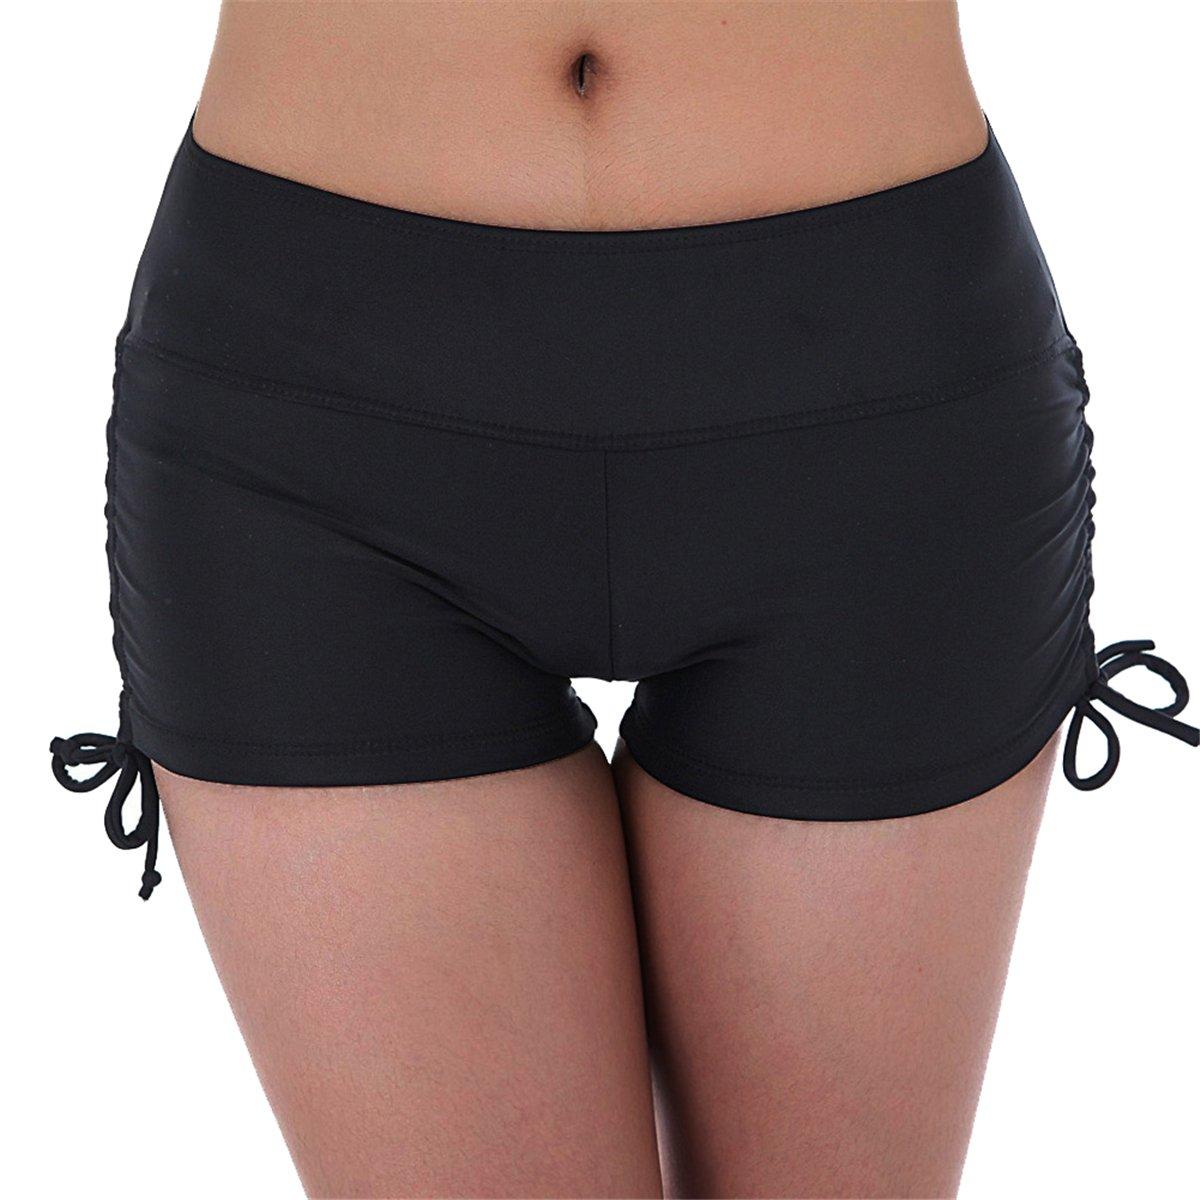 UNOW Women's Sporty Adjustable Boy Leg Wide Waistband Fully Lined Bikini Bottom Beach Briefs Tankinis Board Shorts(Black,L)